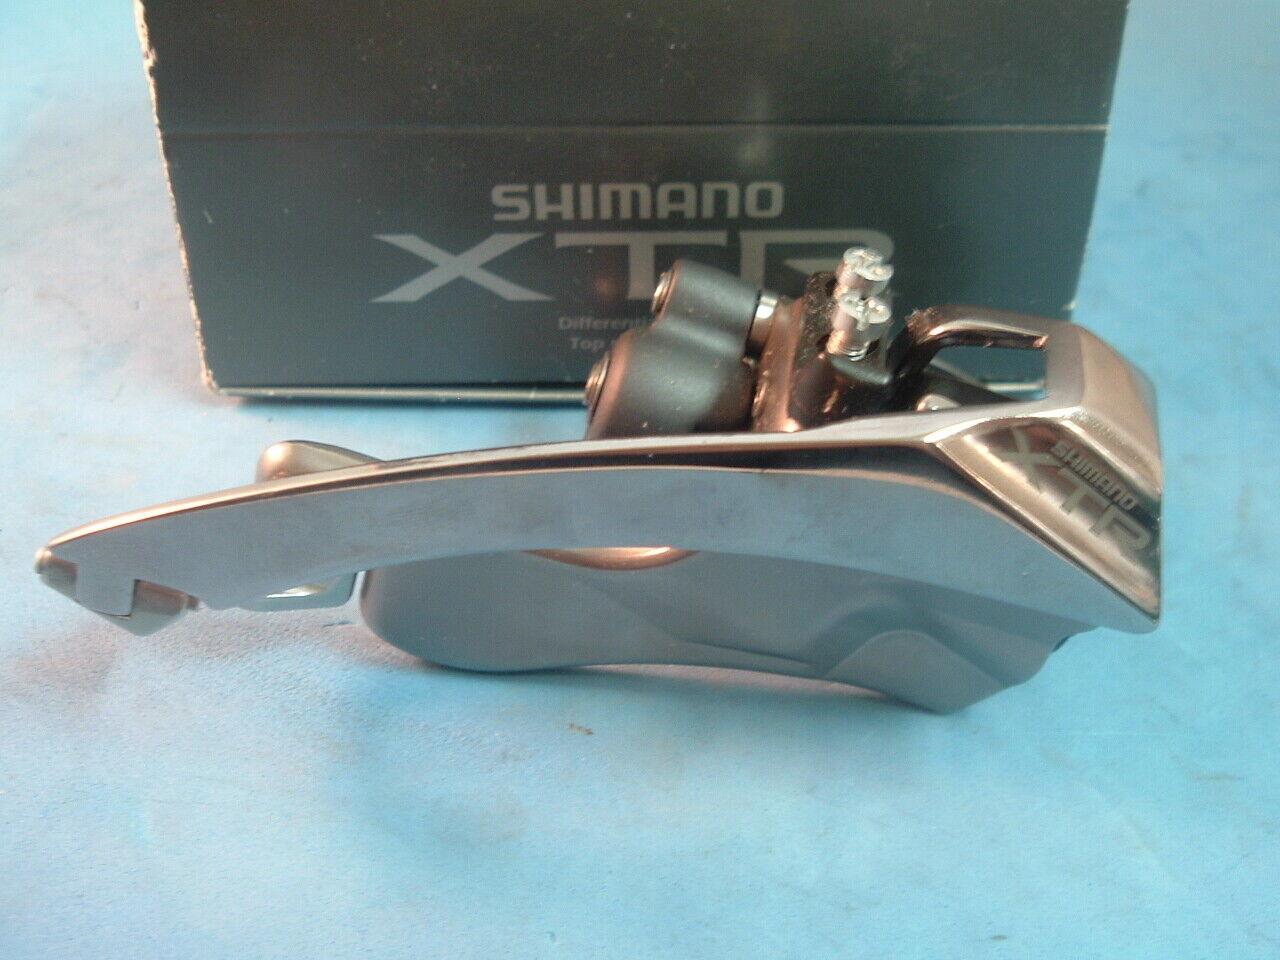 Shimano XTR M950 NEW NOS MTB Front Derailleur Vintage-31.8MM-TP TS-7 8-Spd NIB